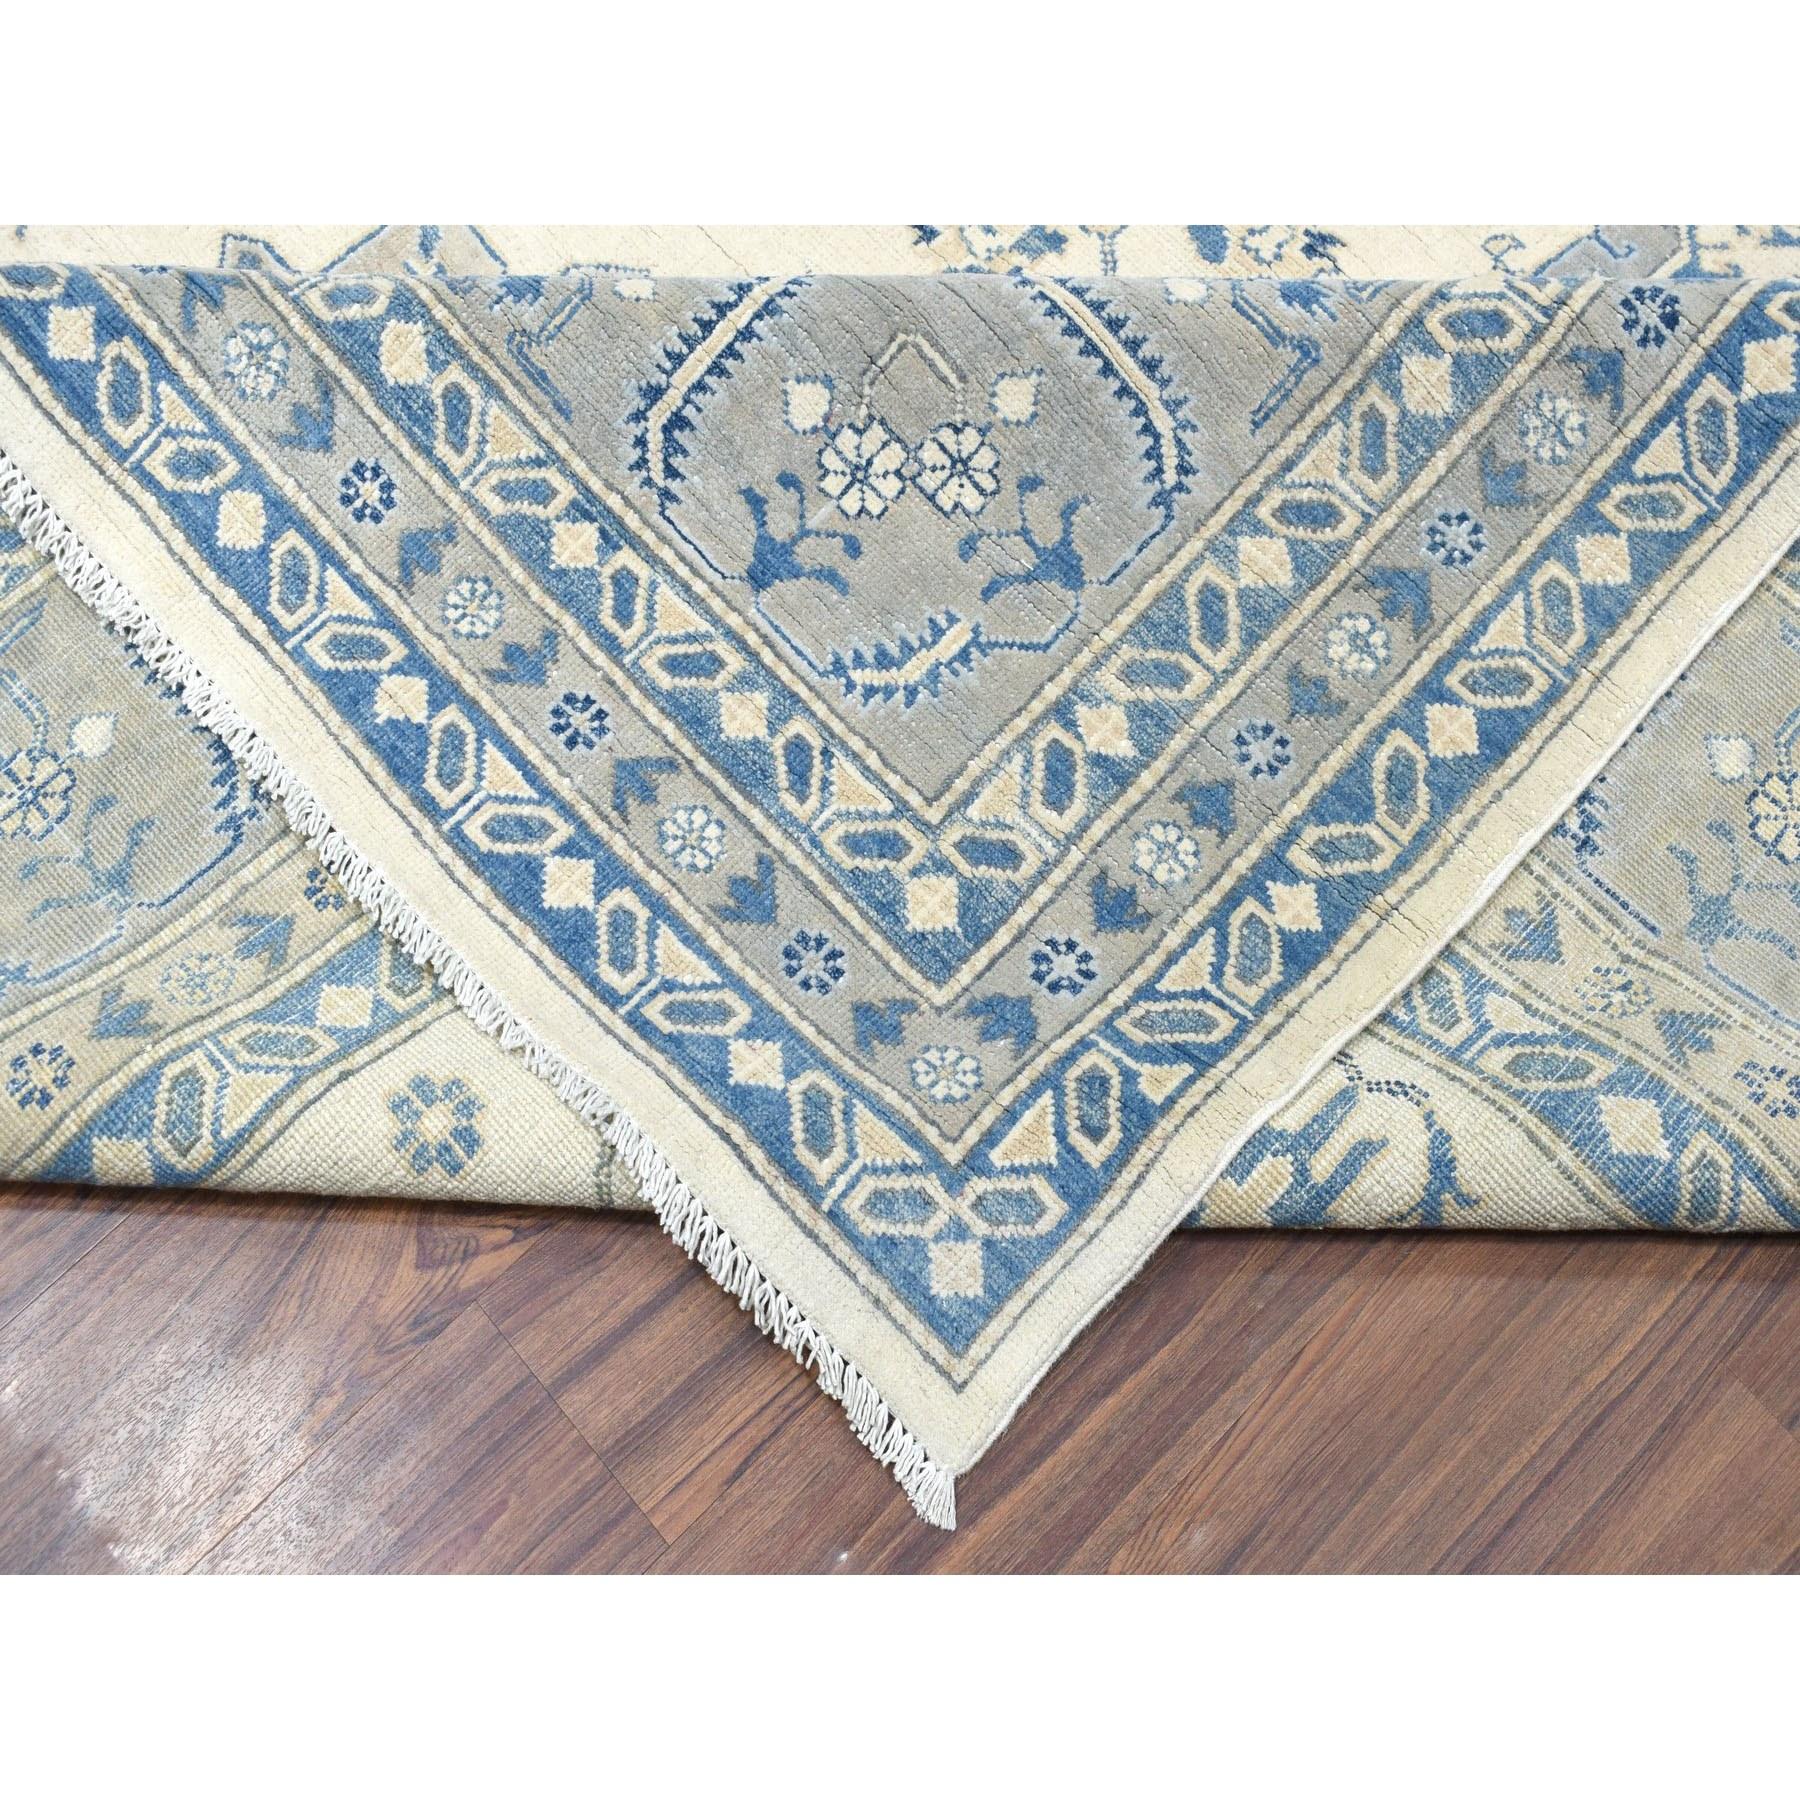 "12'1""x14'5"" Oversized Ivory Vintage Look Kazak Pure Wool Hand Knotted Oriental Rug"